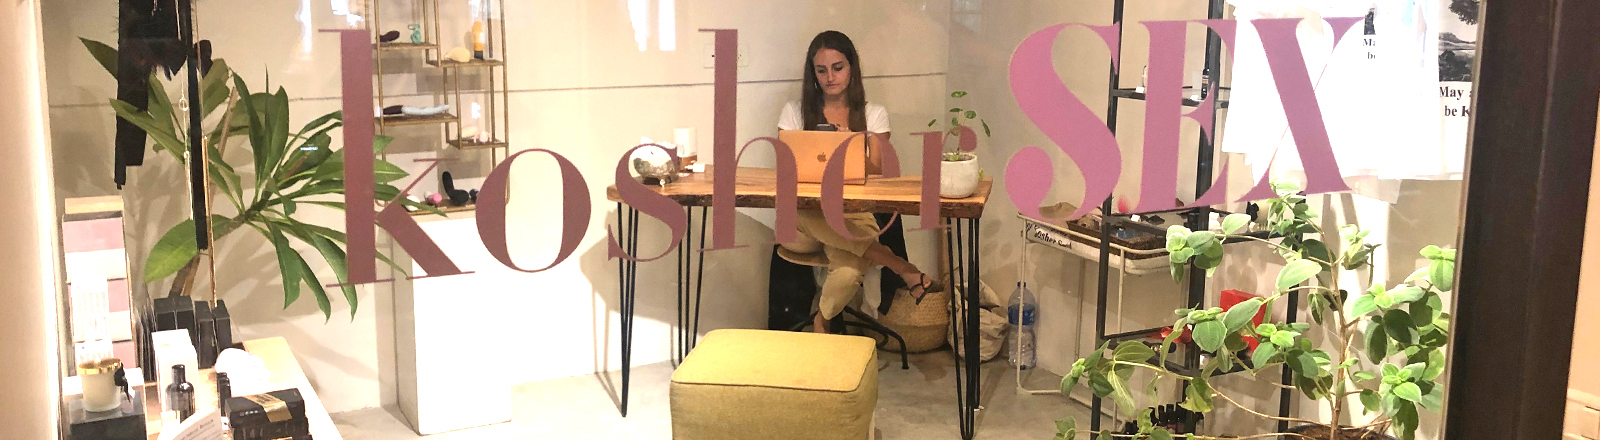 Koscherer Sex-Shop in Tel Aviv